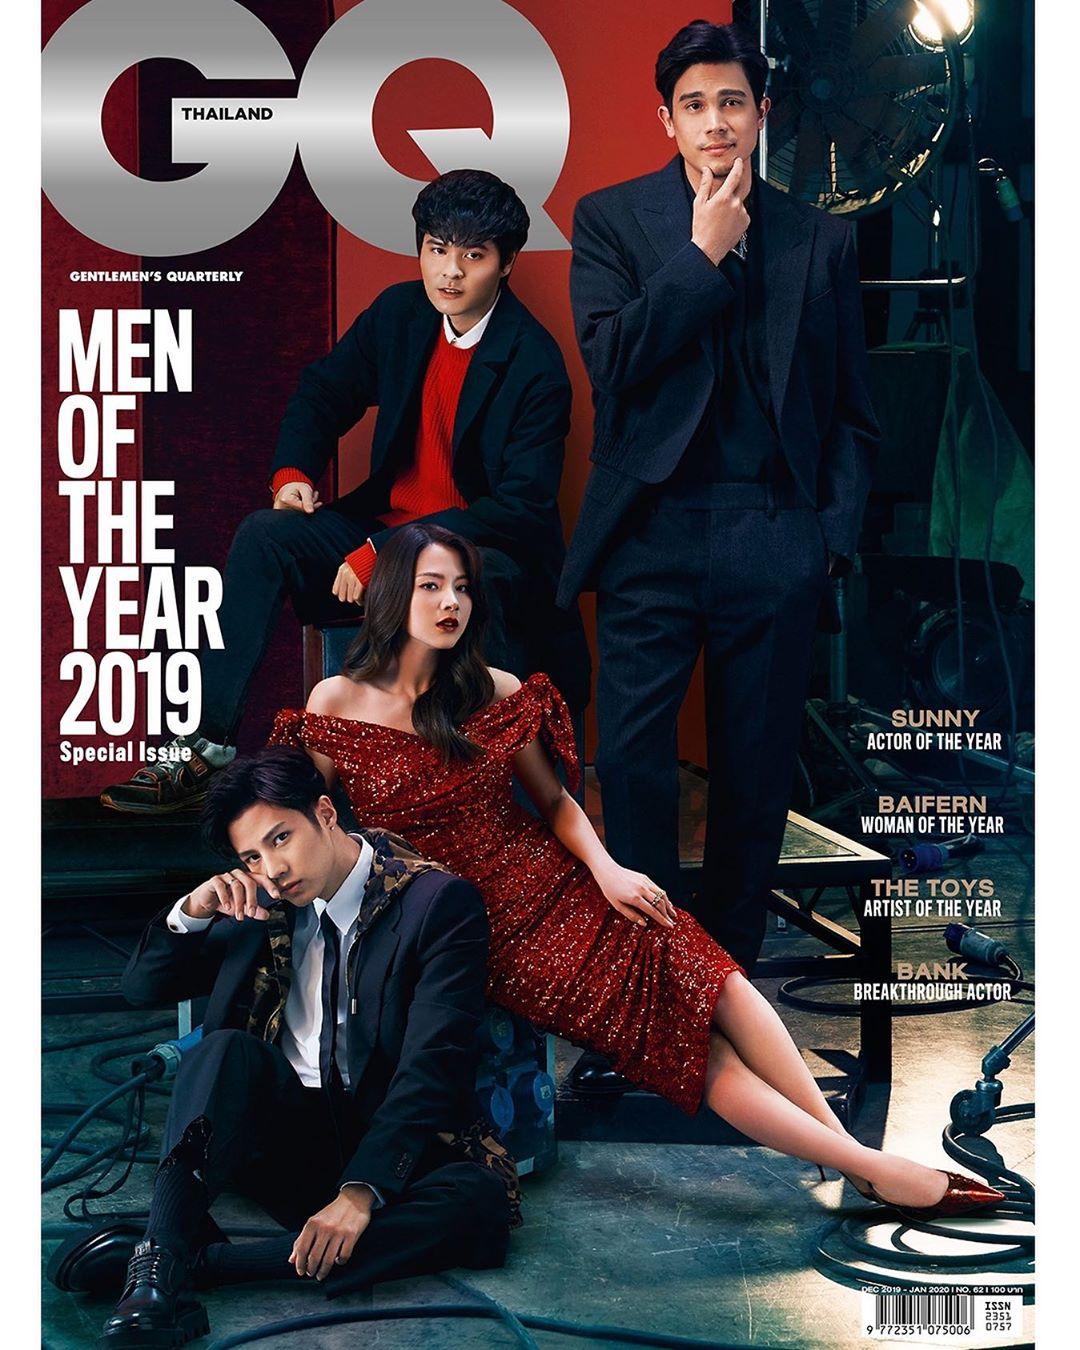 GQ Thailand January 2020, Sunny Suwanmethanon, Pimchanok Luevisadpaibul, The Toys